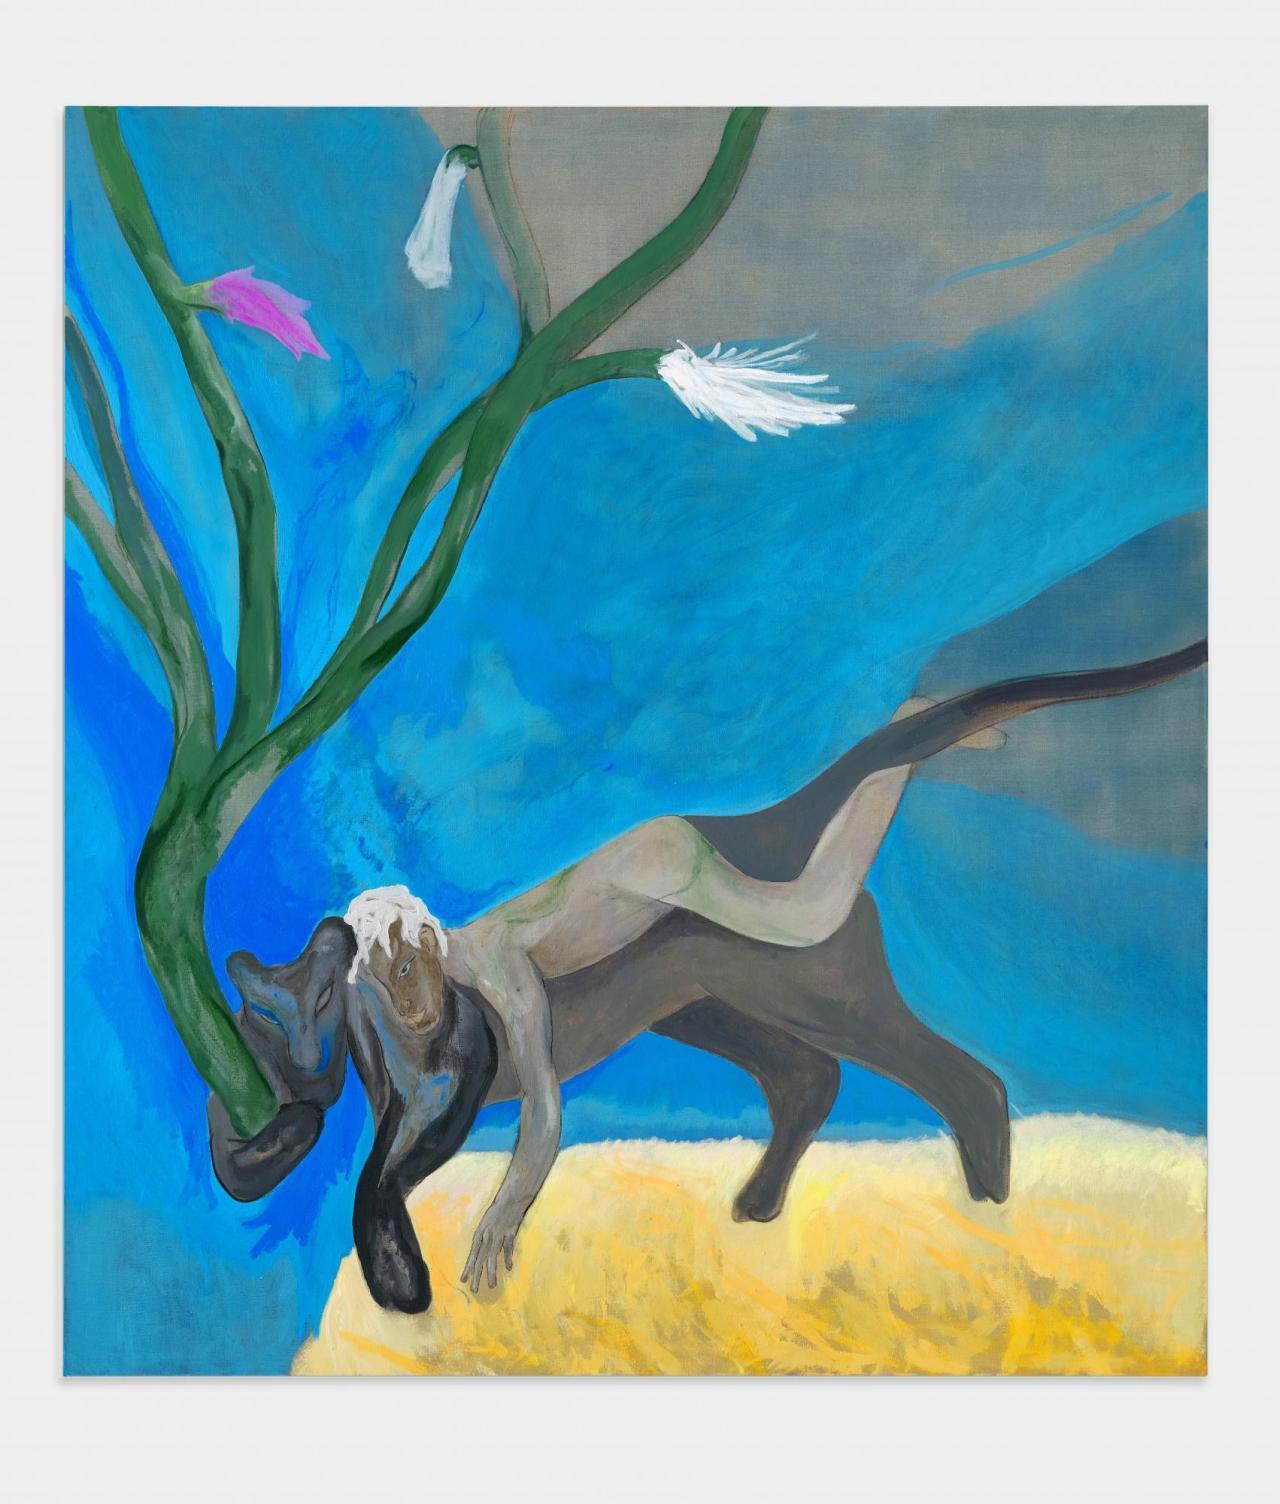 Paolo Salvador, El anda a jaguar , 2021 Painting, oil on linen 200 x 180 cm, courtesy Peres Projects